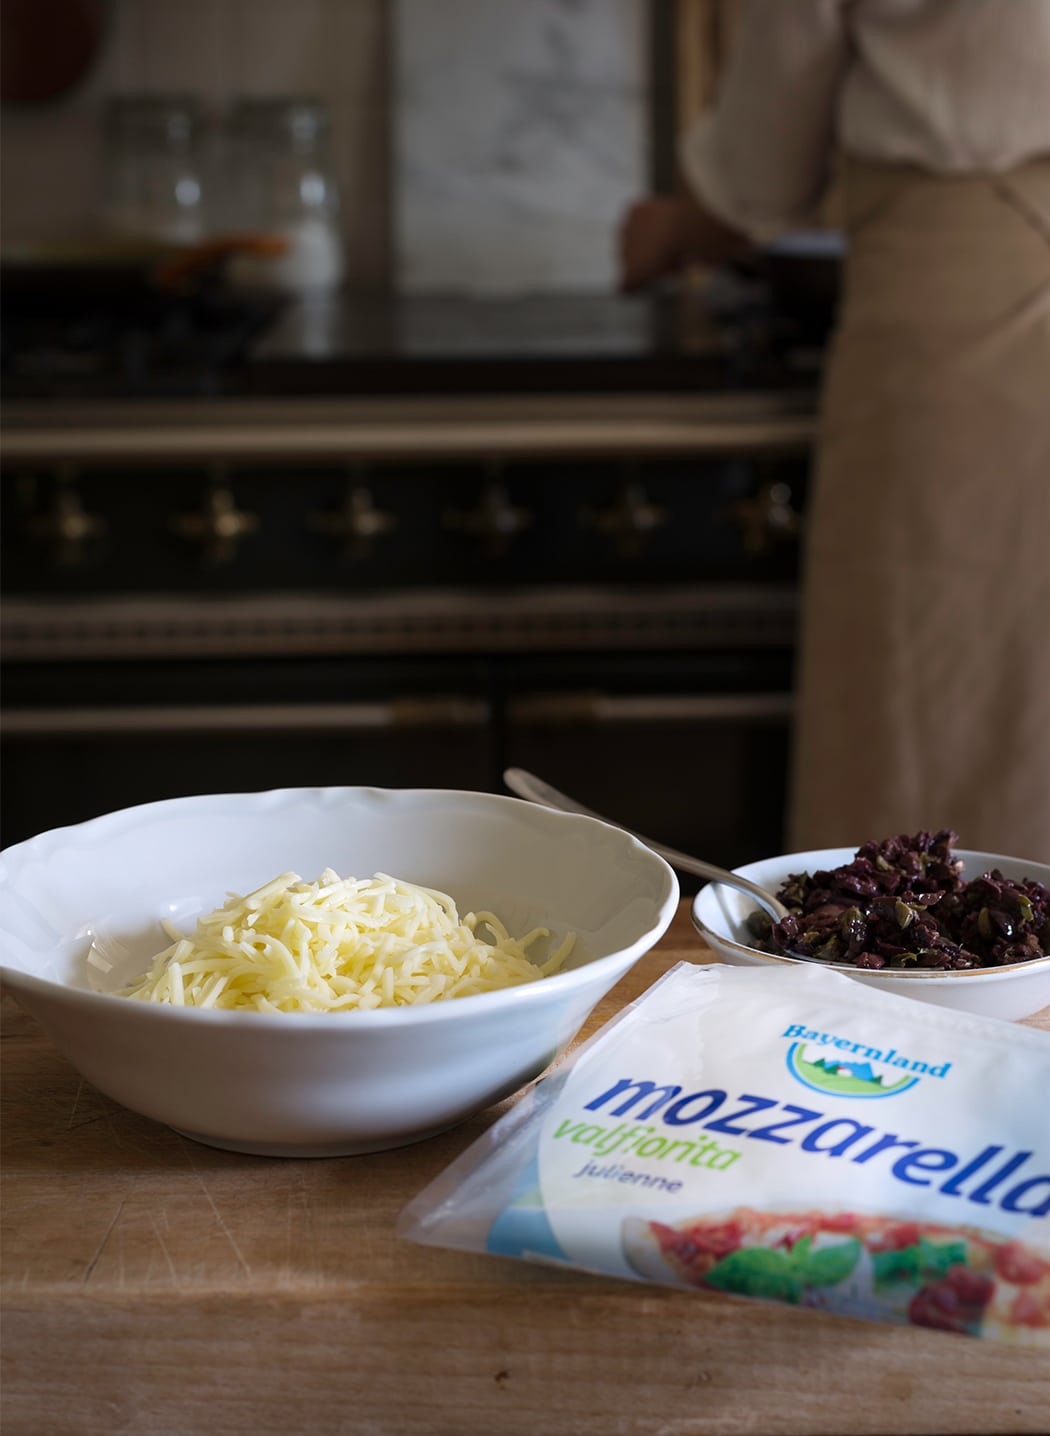 ricette con mozzarella a joulienne e olive